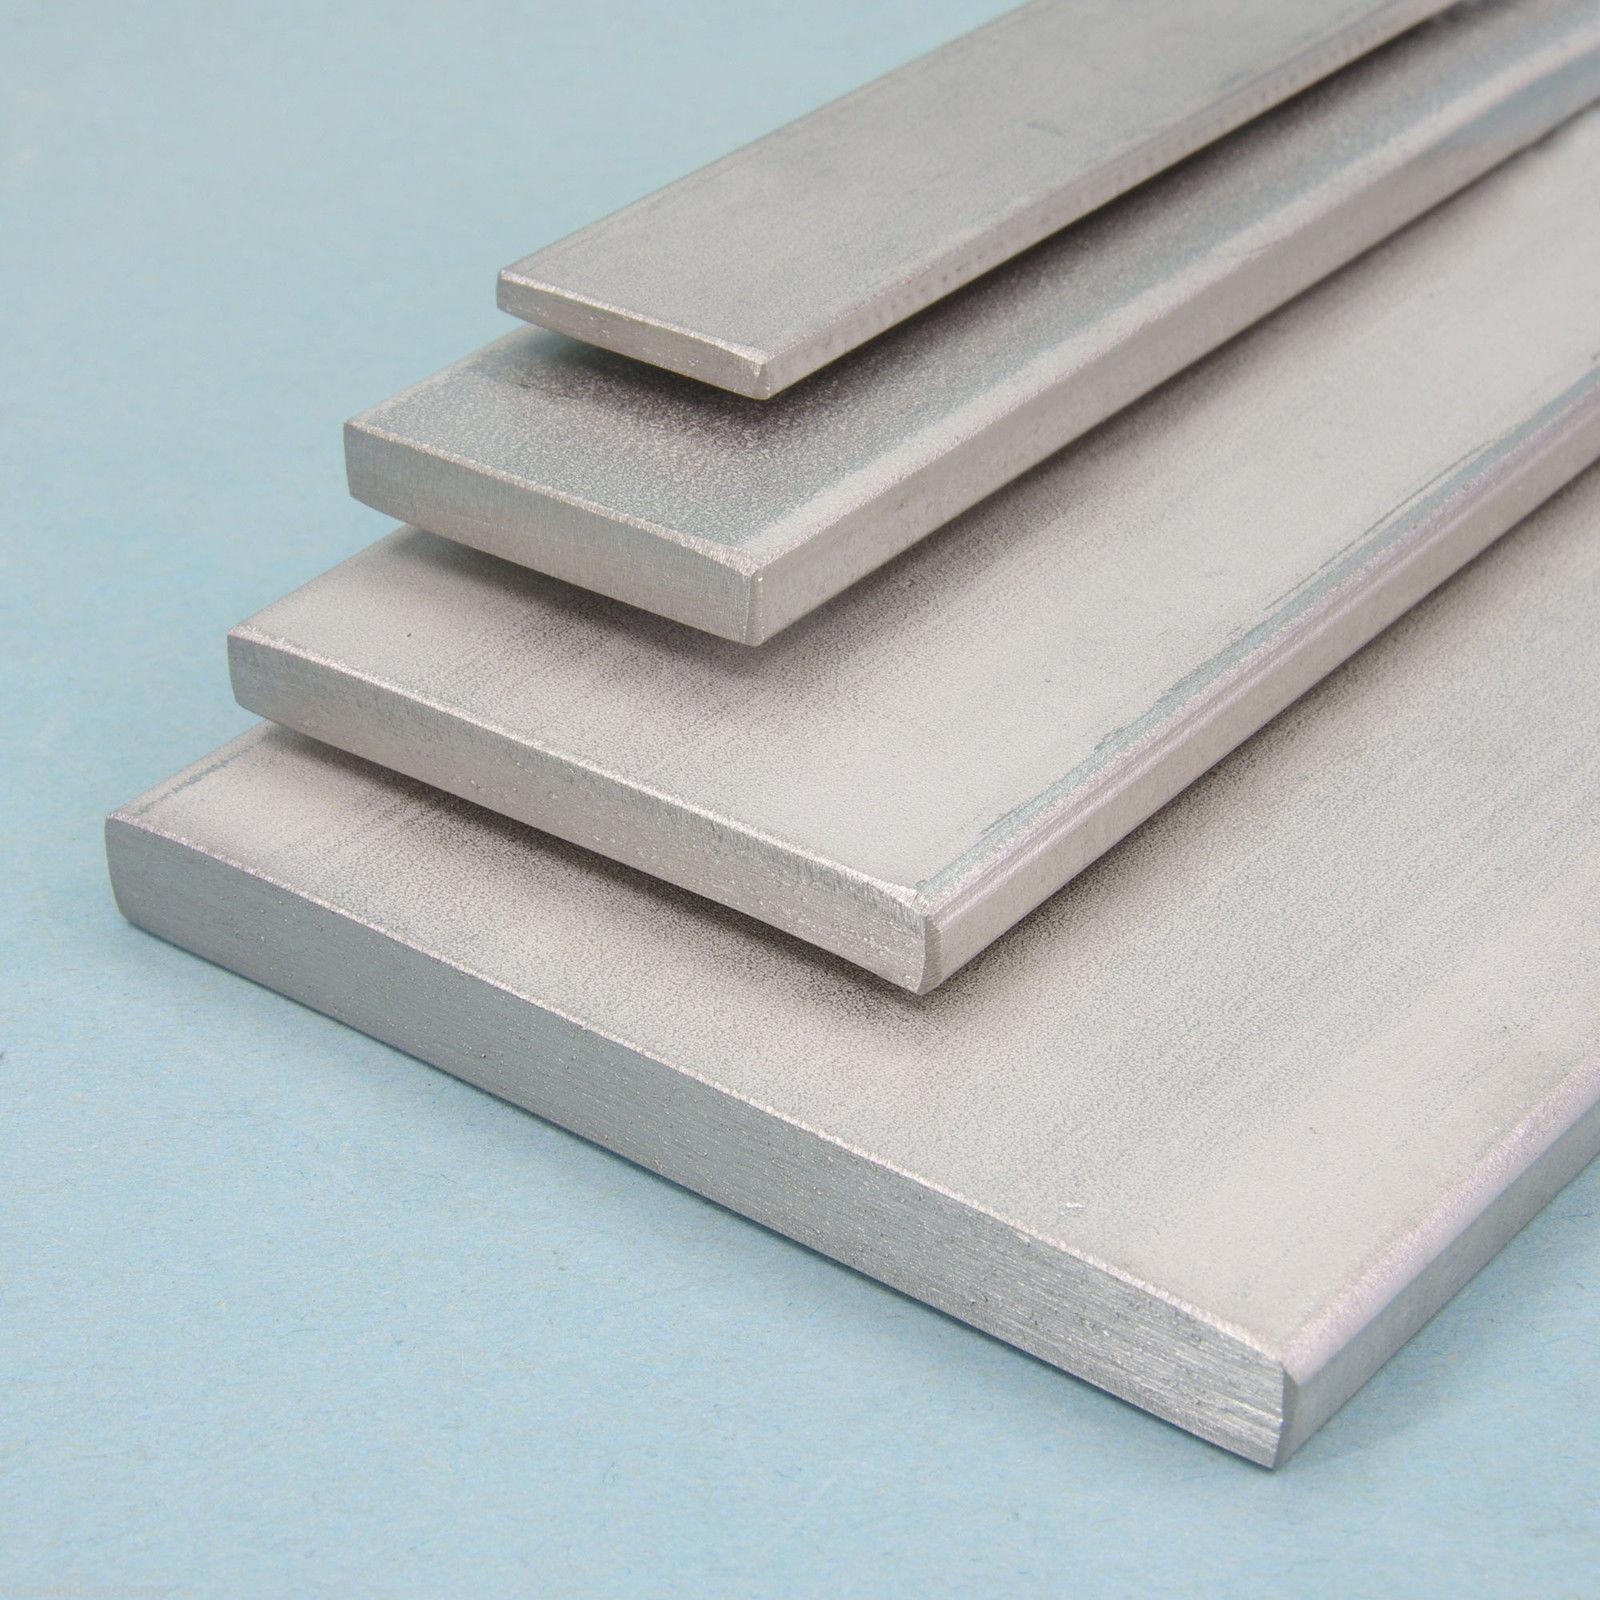 flachstange aluminium almgsi 0 5 profil alu profil flach stange flachmaterial ebay. Black Bedroom Furniture Sets. Home Design Ideas